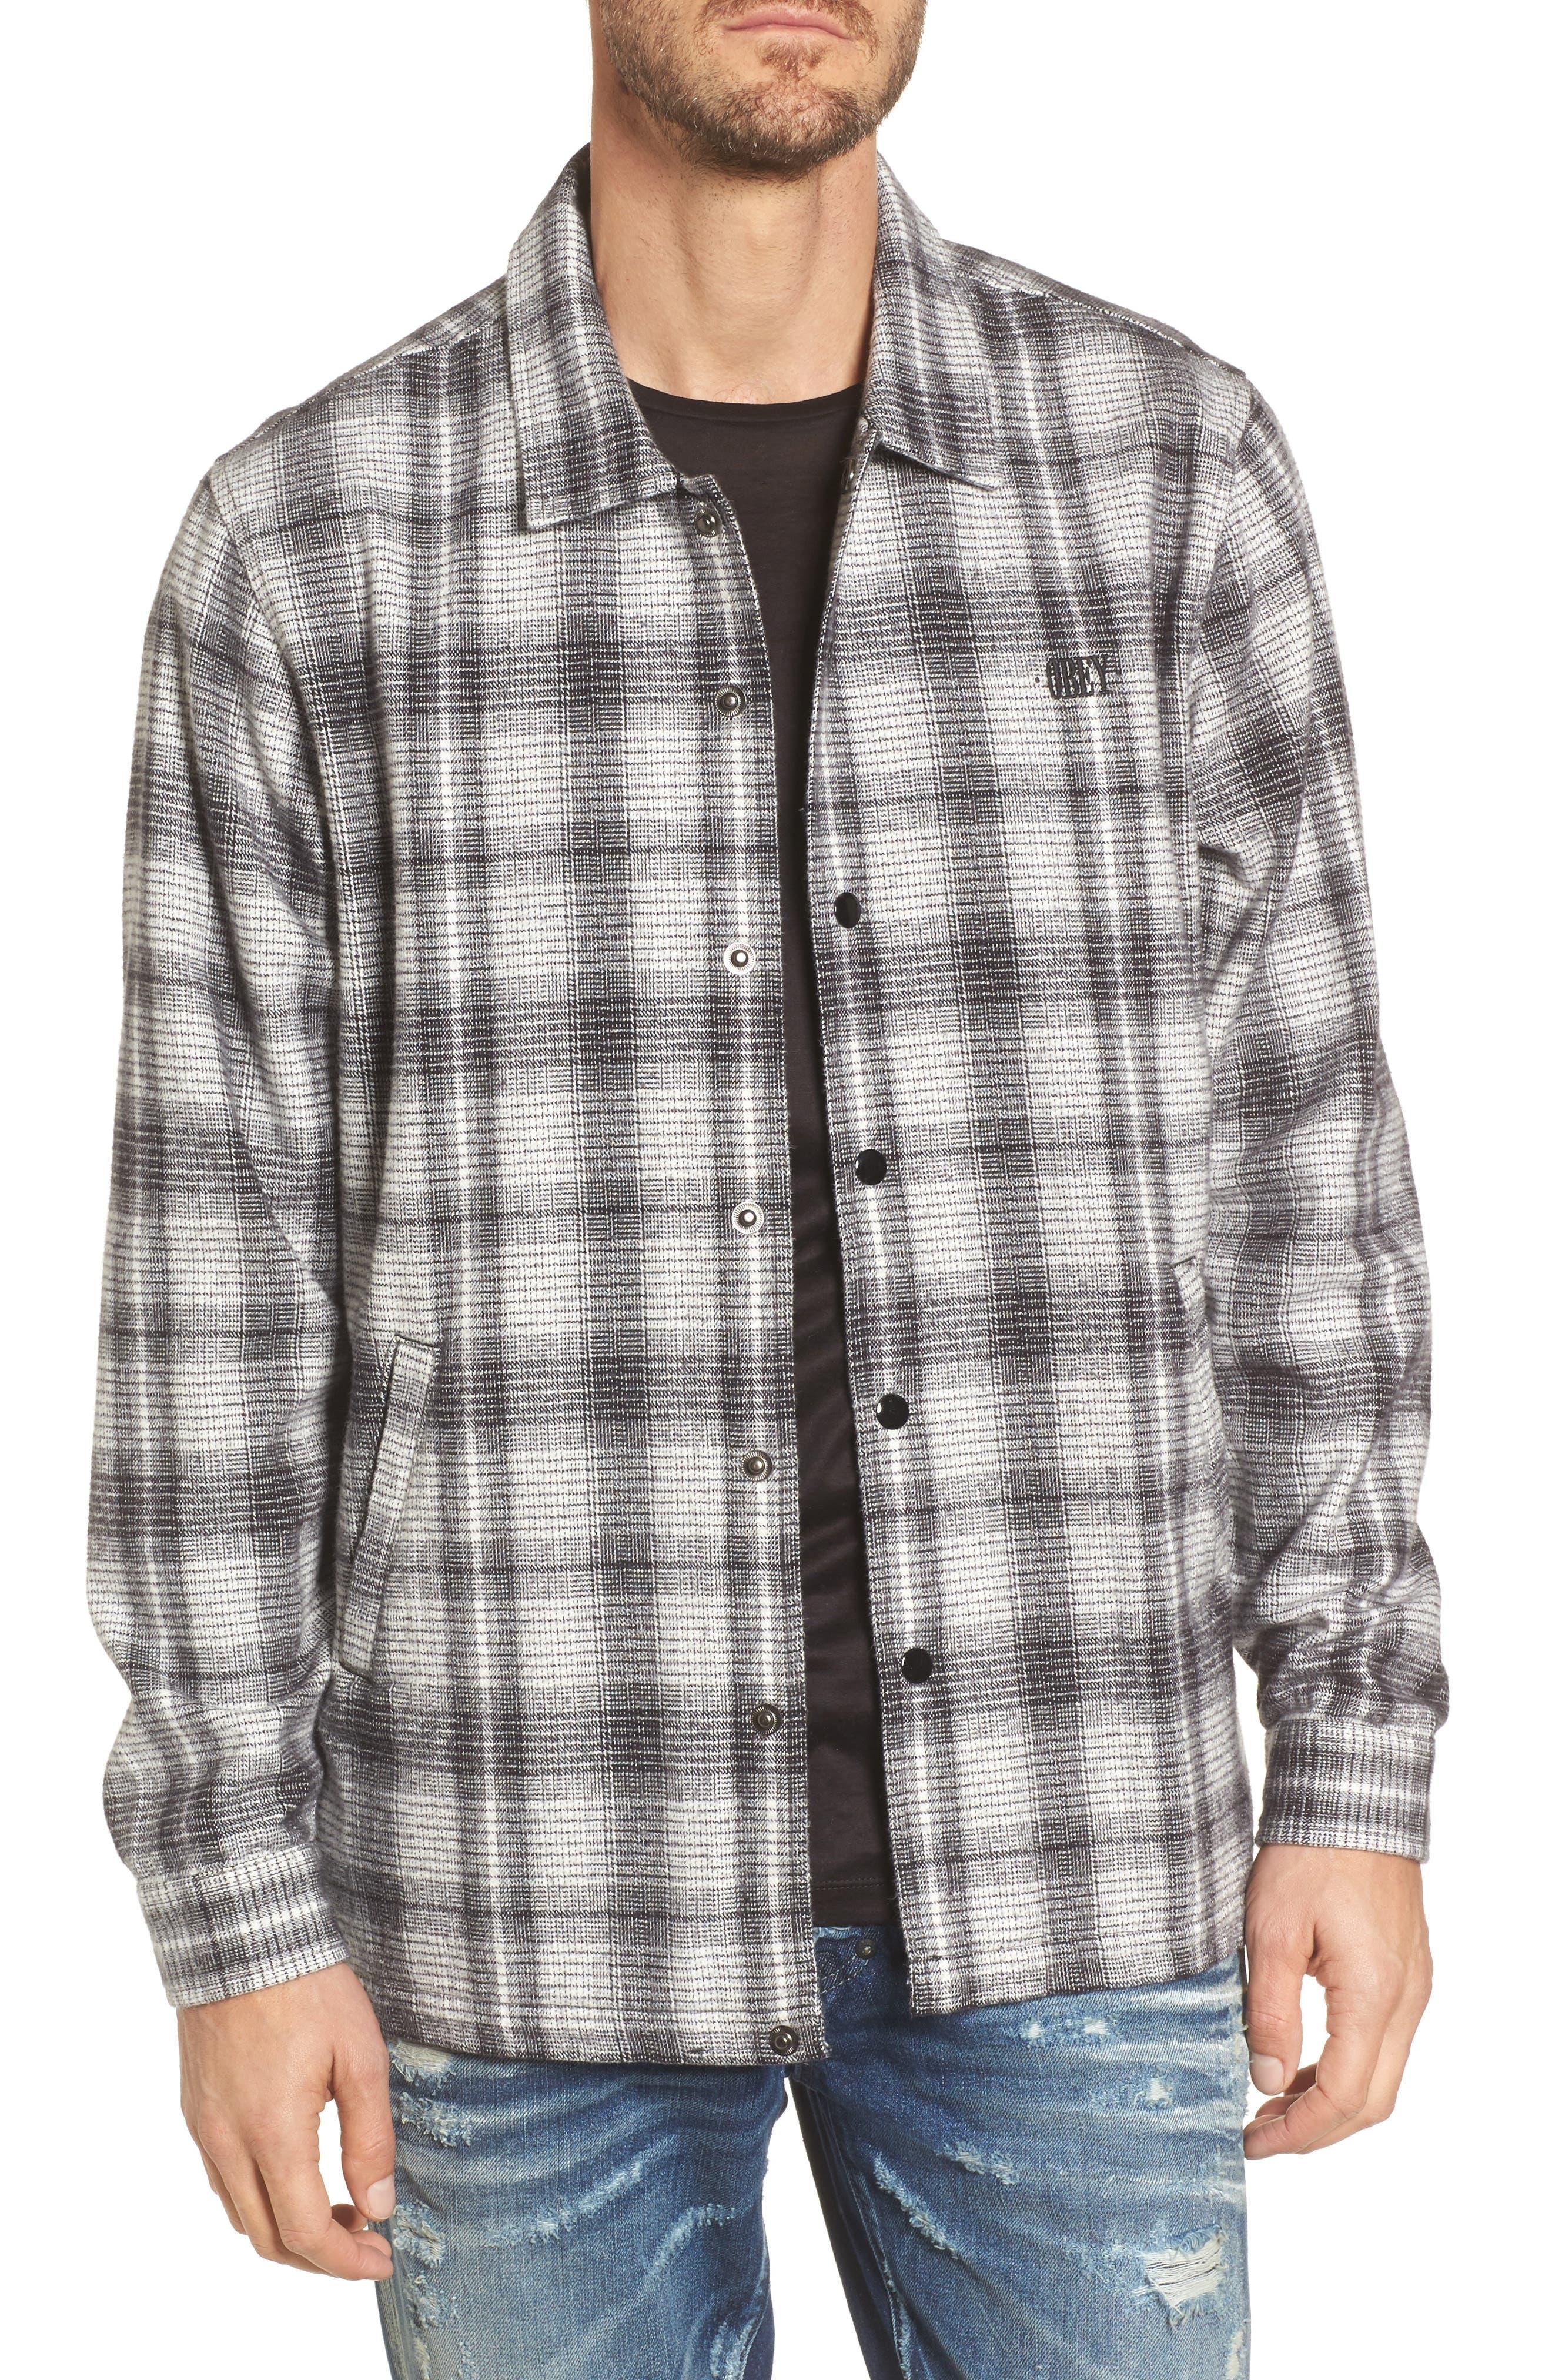 Whittier Plaid Flannel Shirt Jacket,                         Main,                         color, Neutral Grey Multi